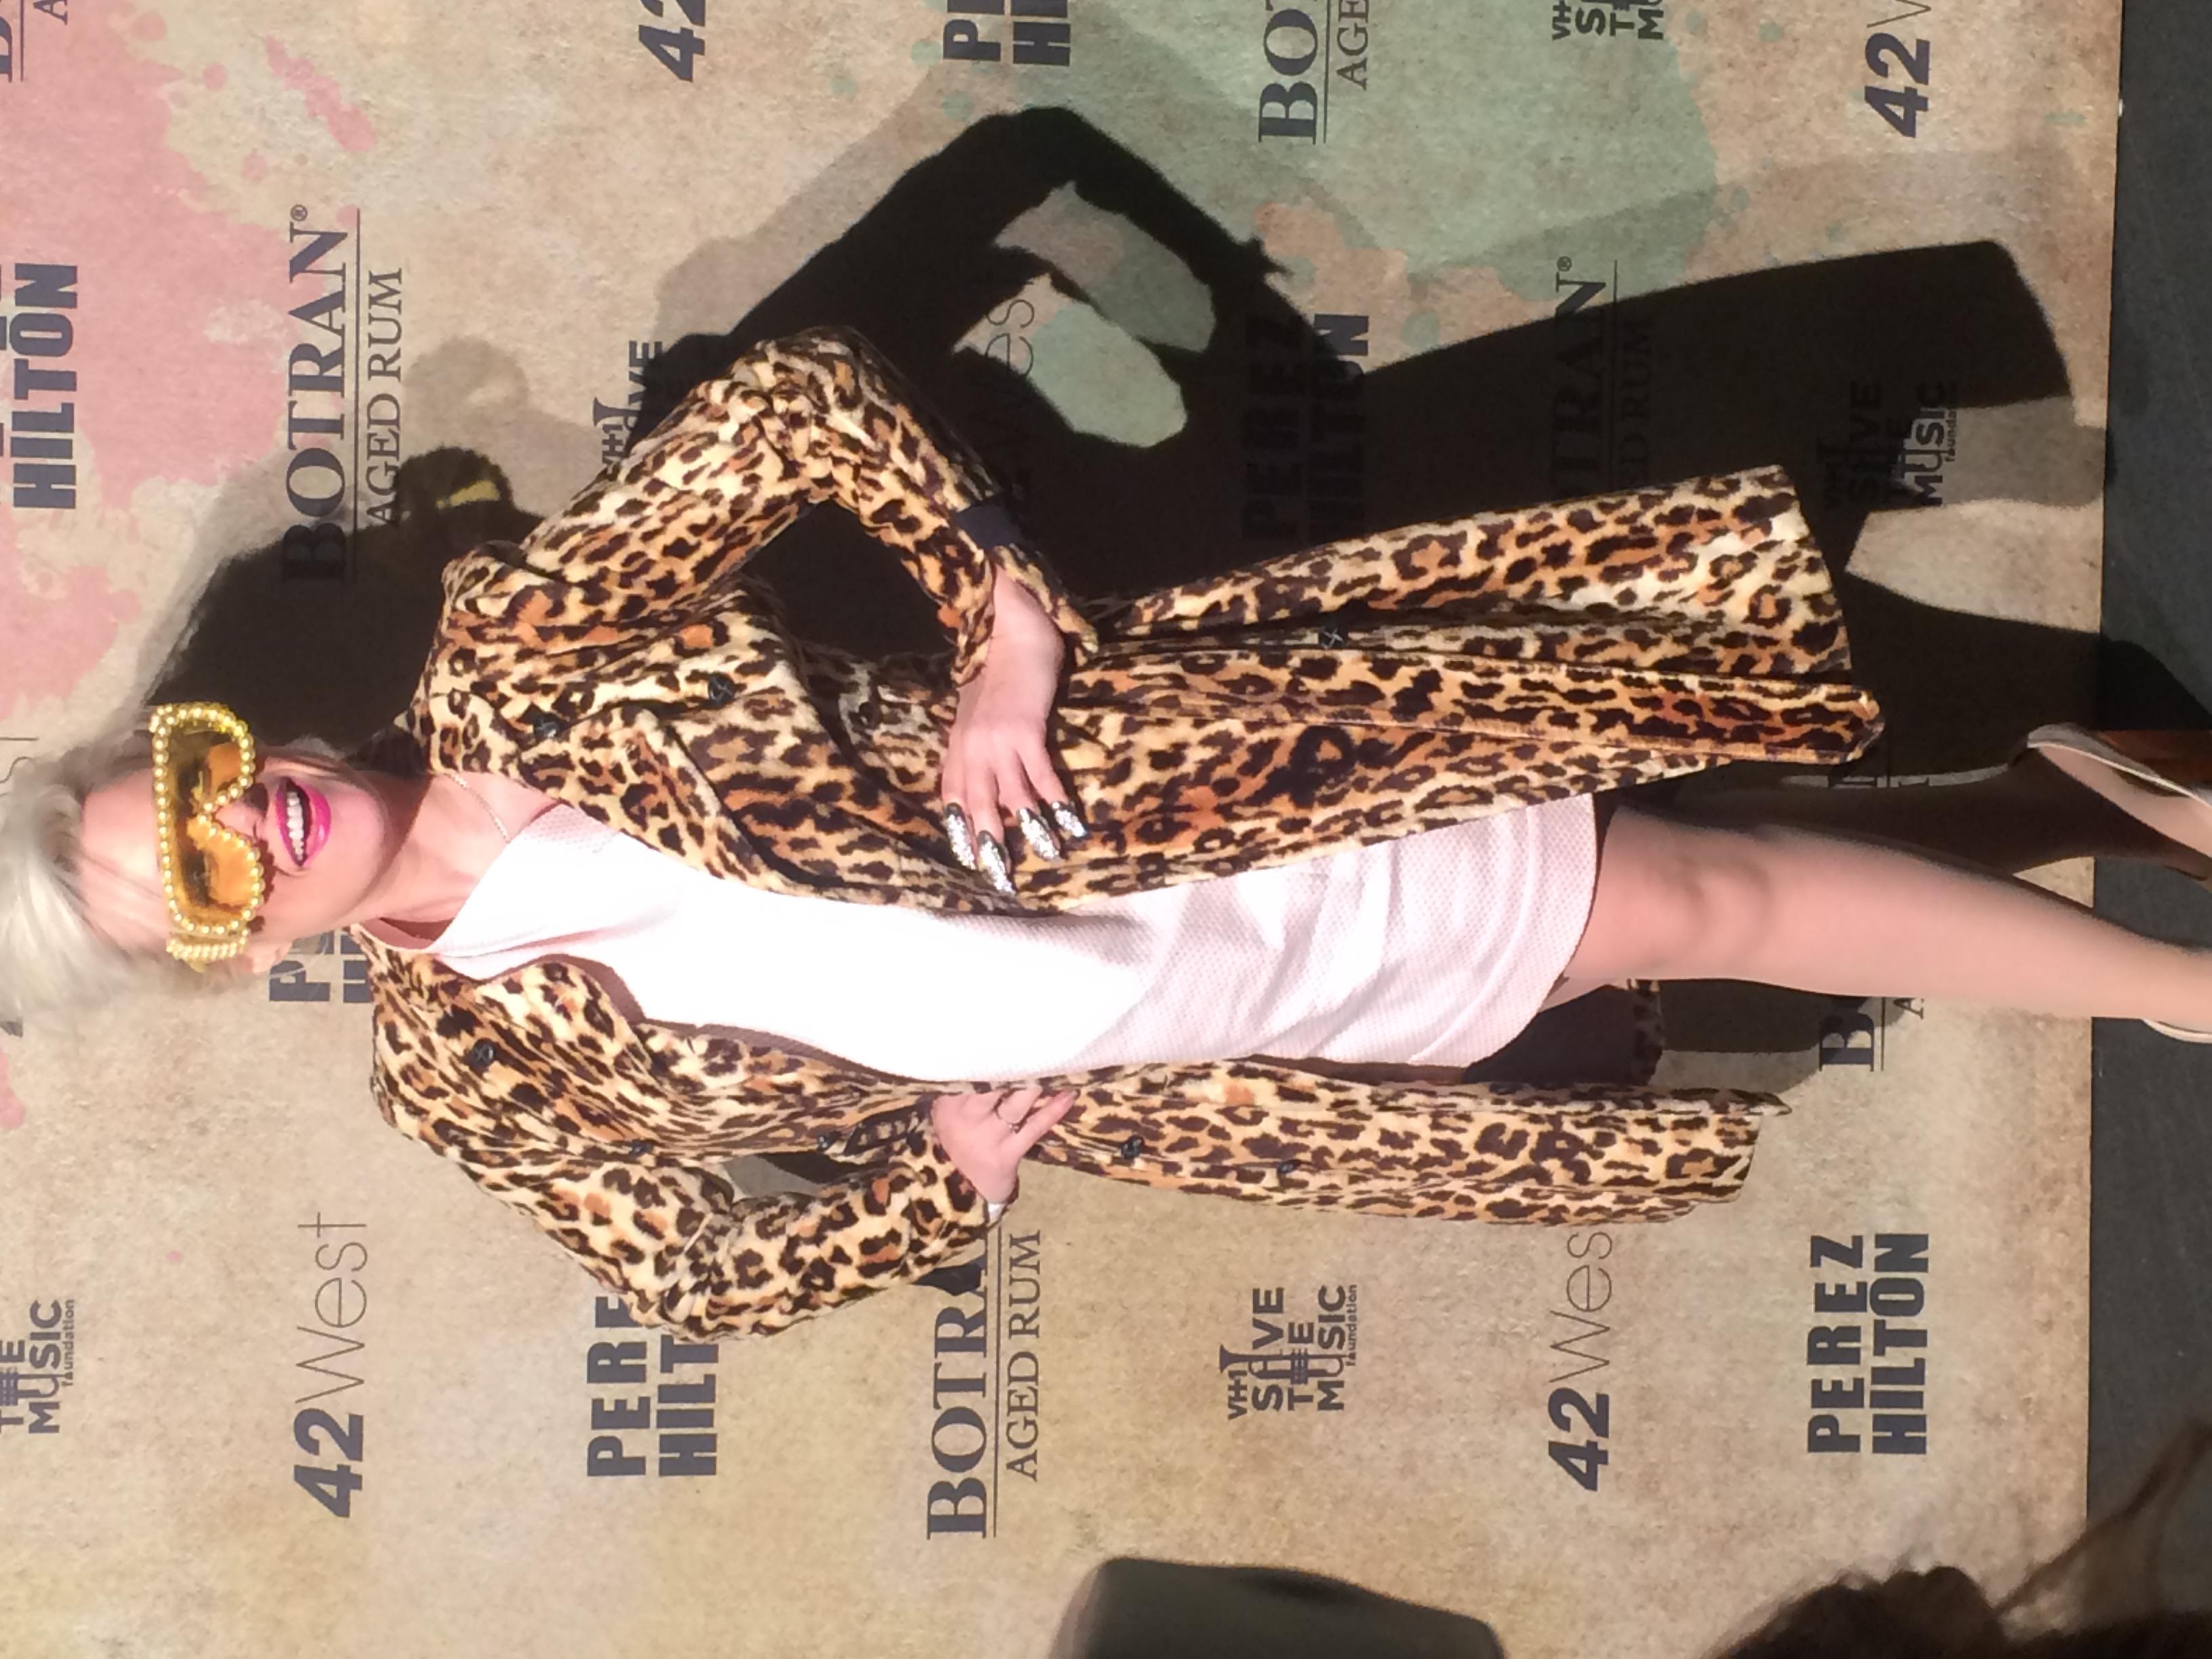 File:Princess Superstar at Perez Hilton's Birthday PArty 2014..JPG -  Wikimedia Commons